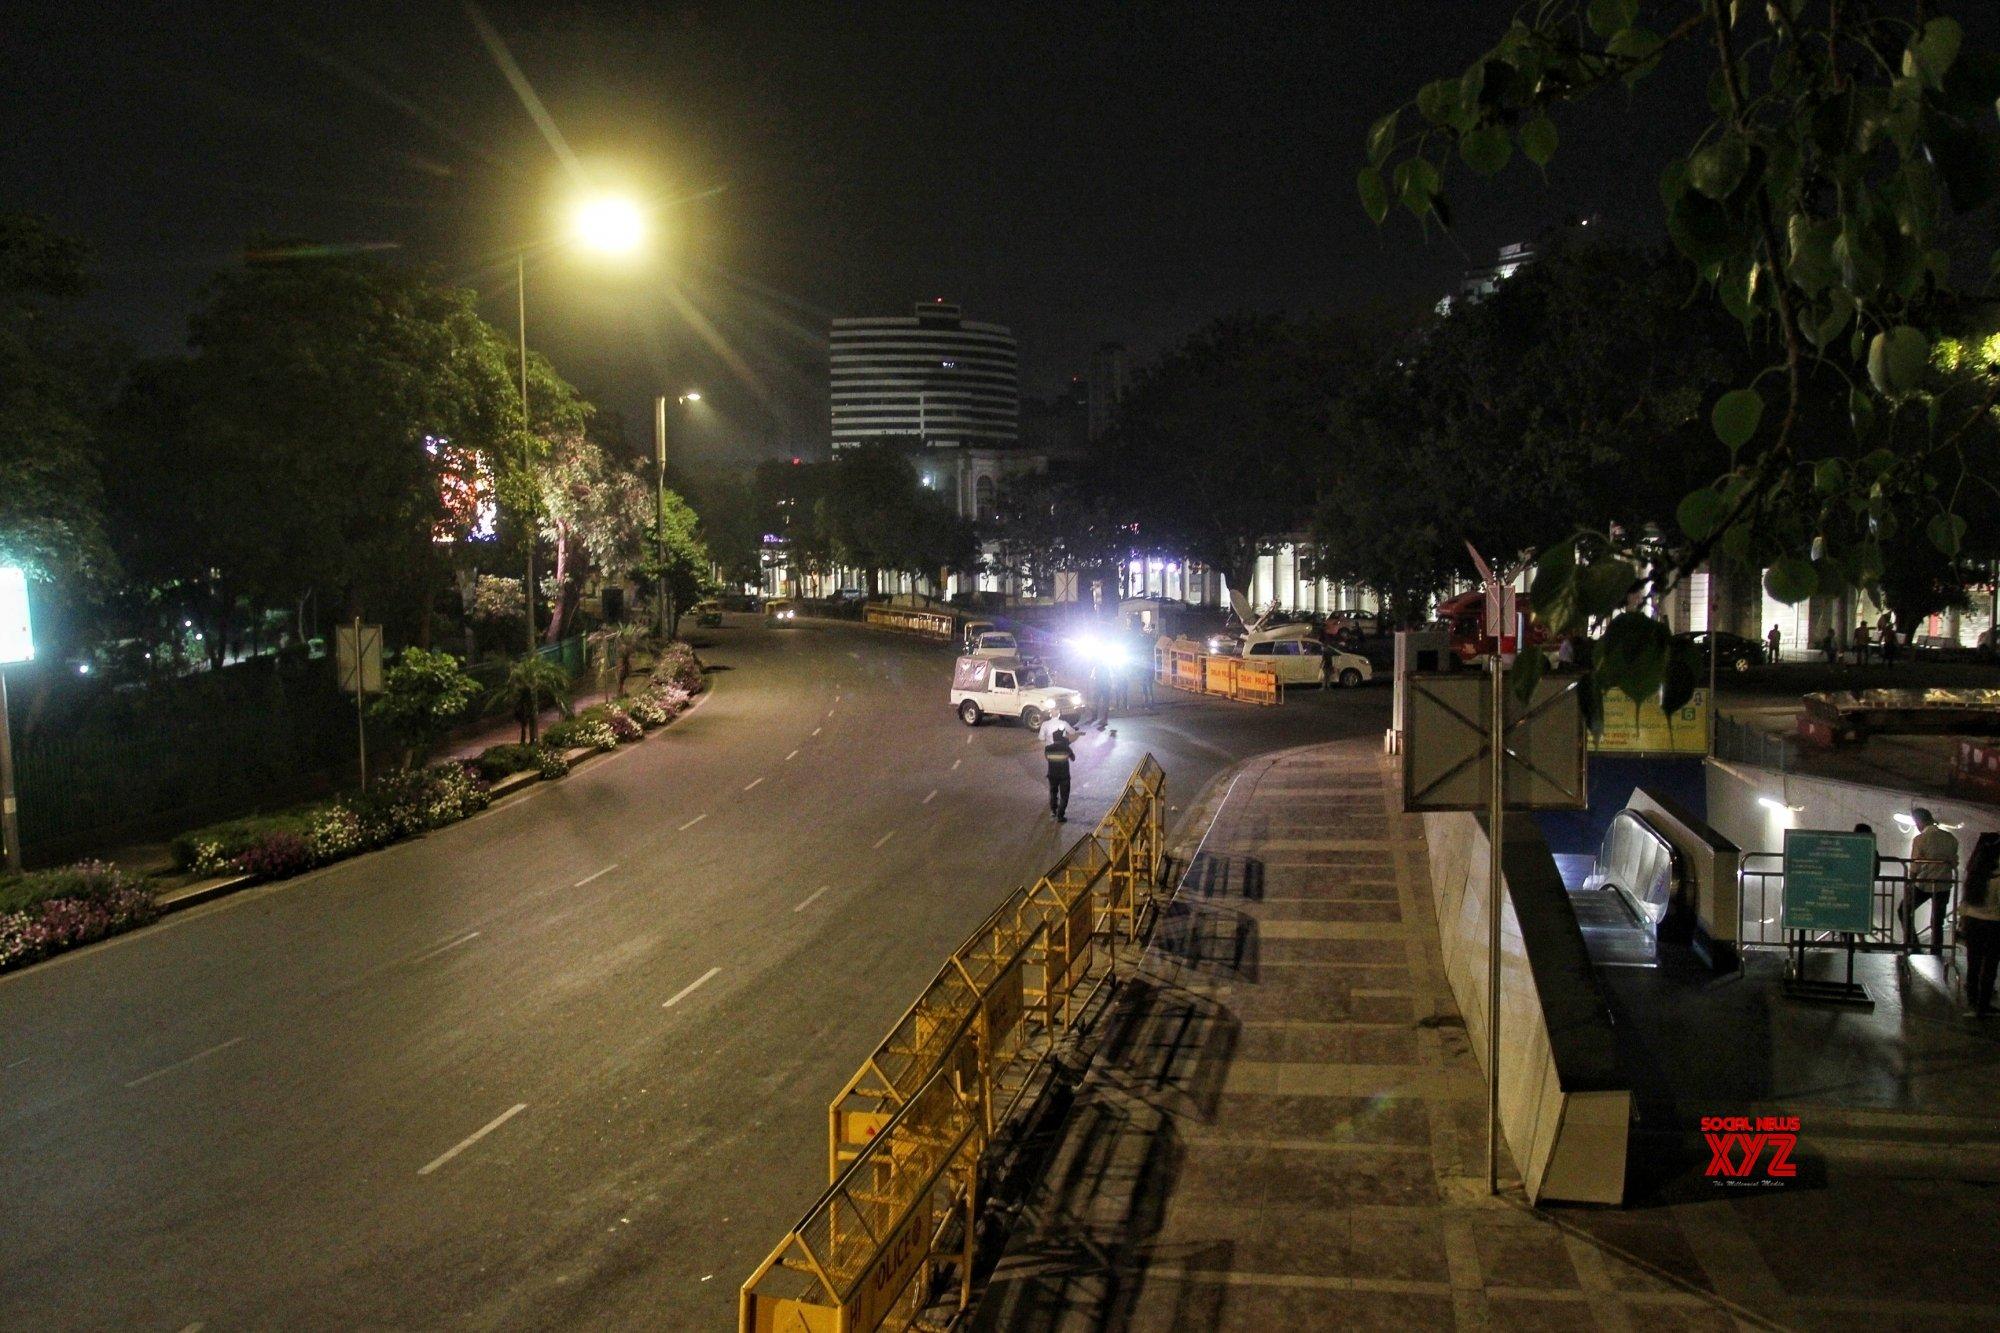 Night curfew hampering weddings, business in capital